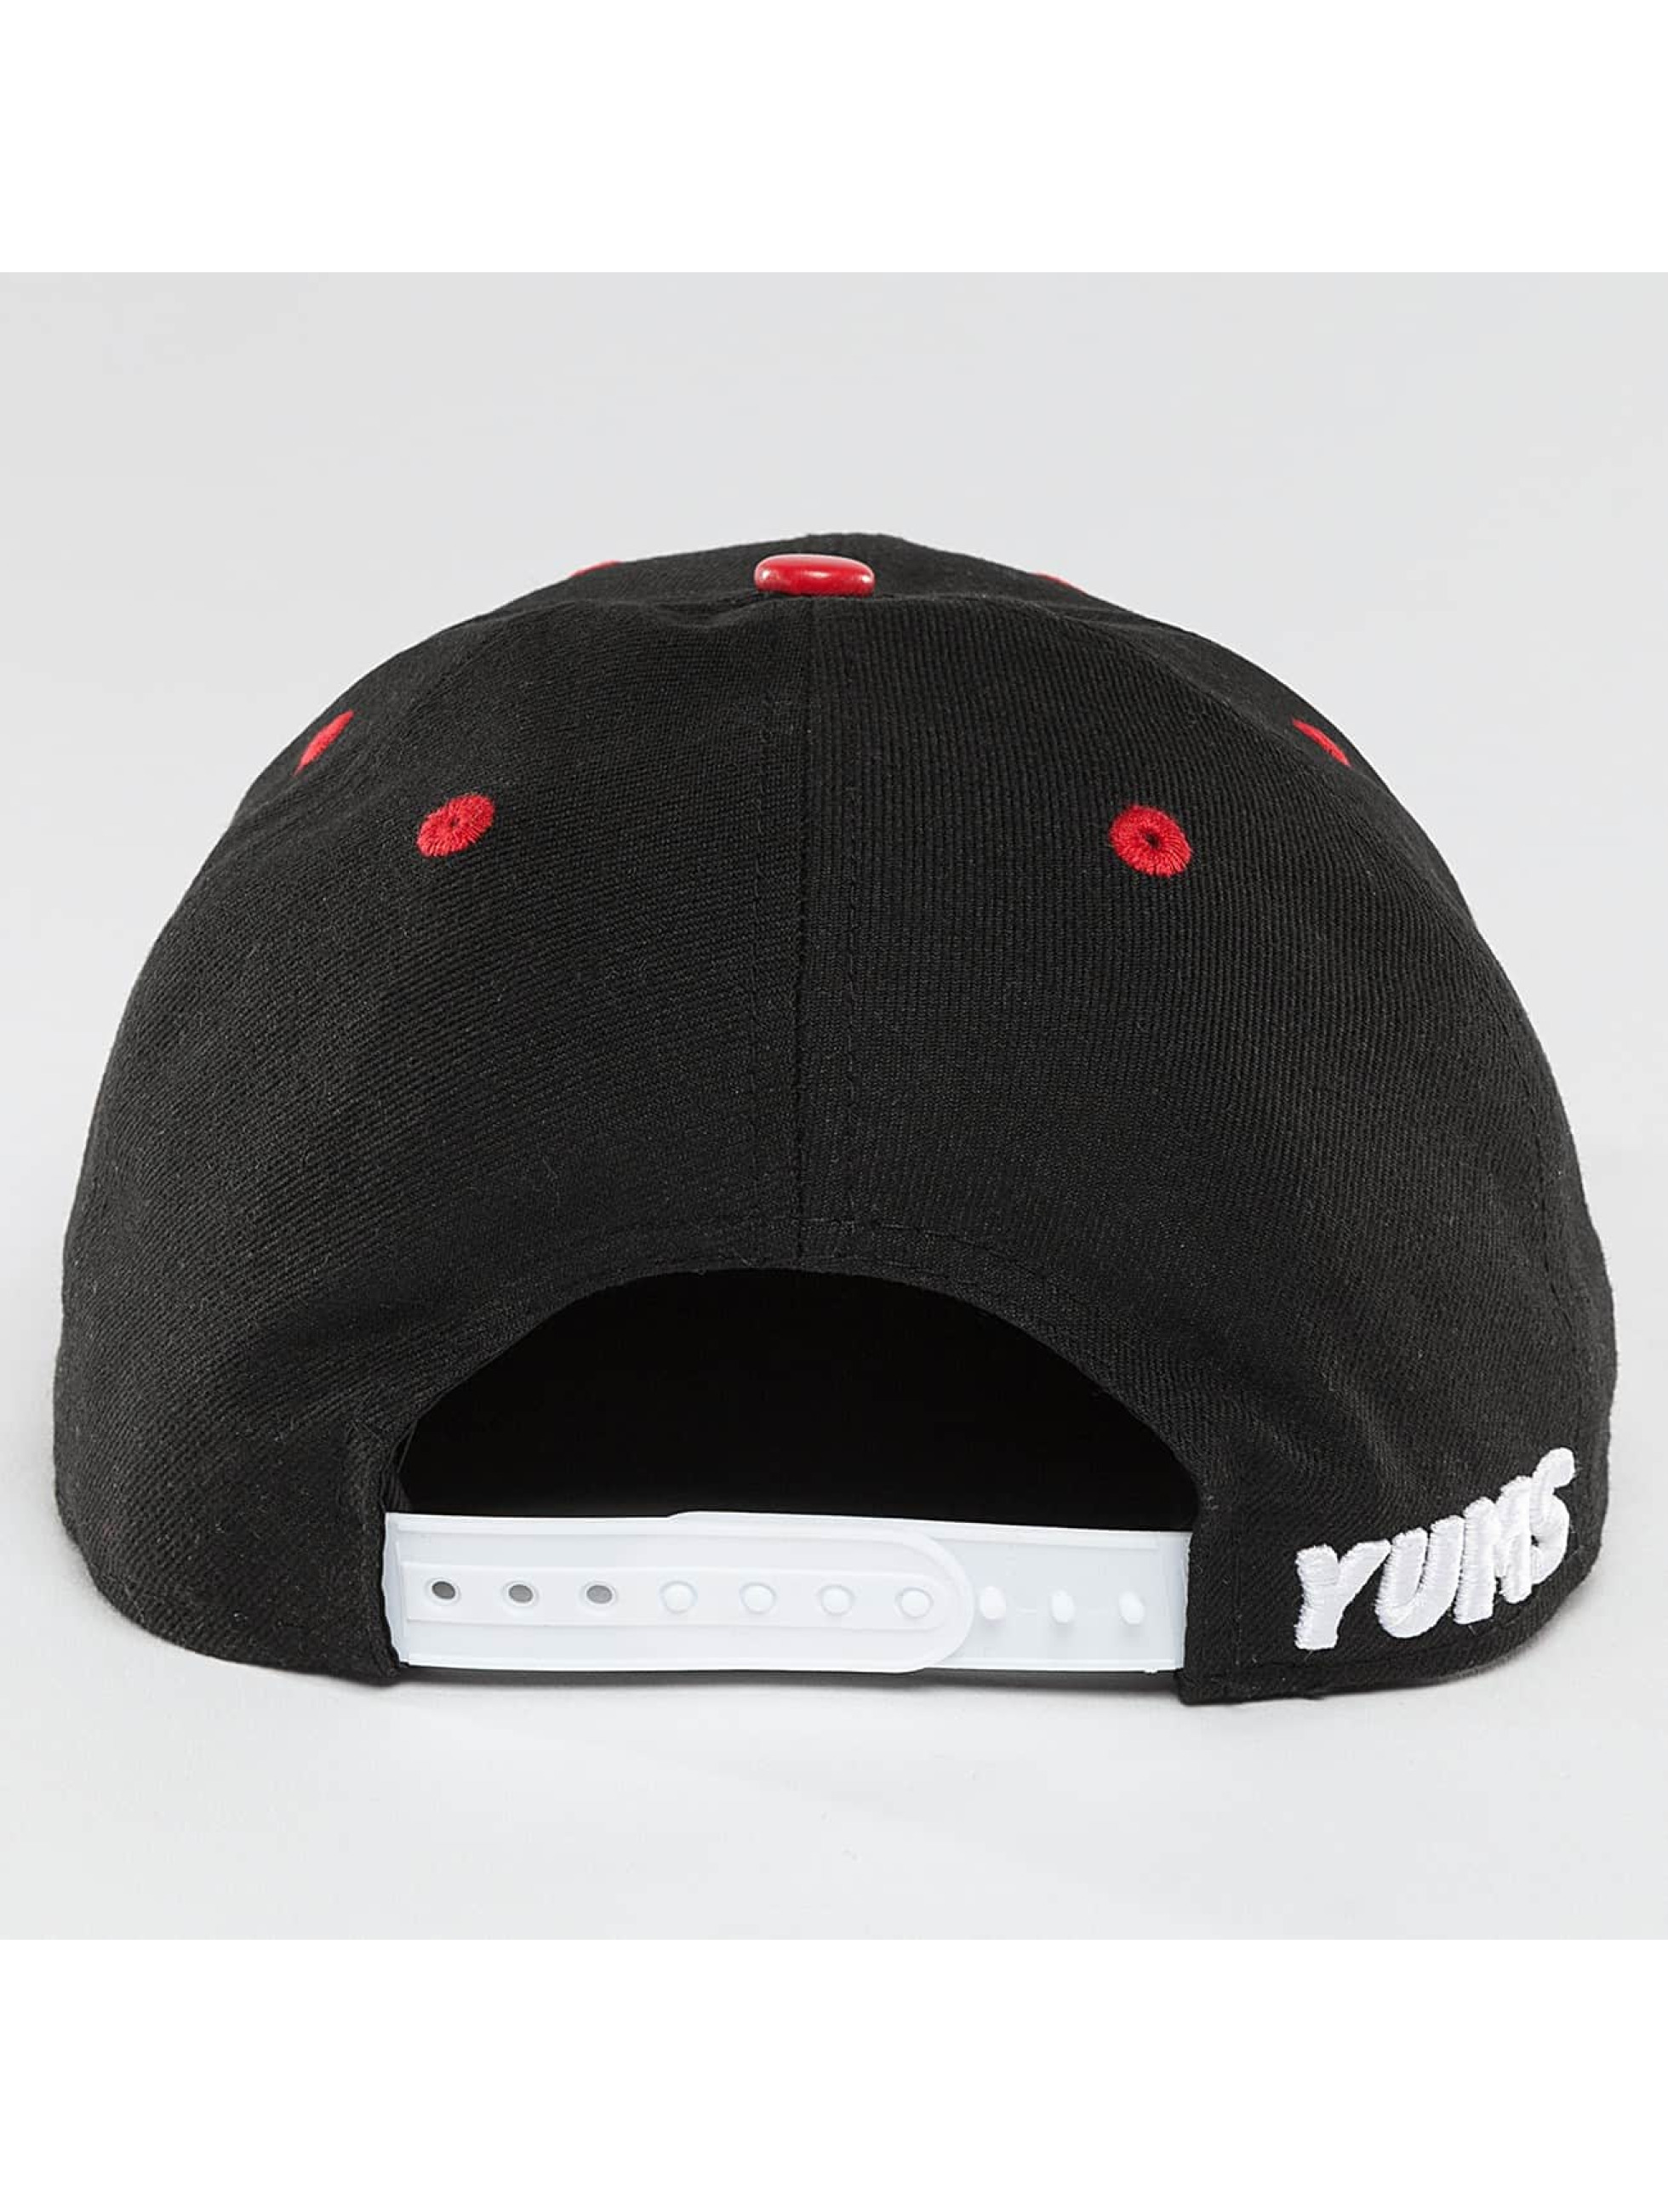 Yums Snapback Caps Ballistic Thinking d čern